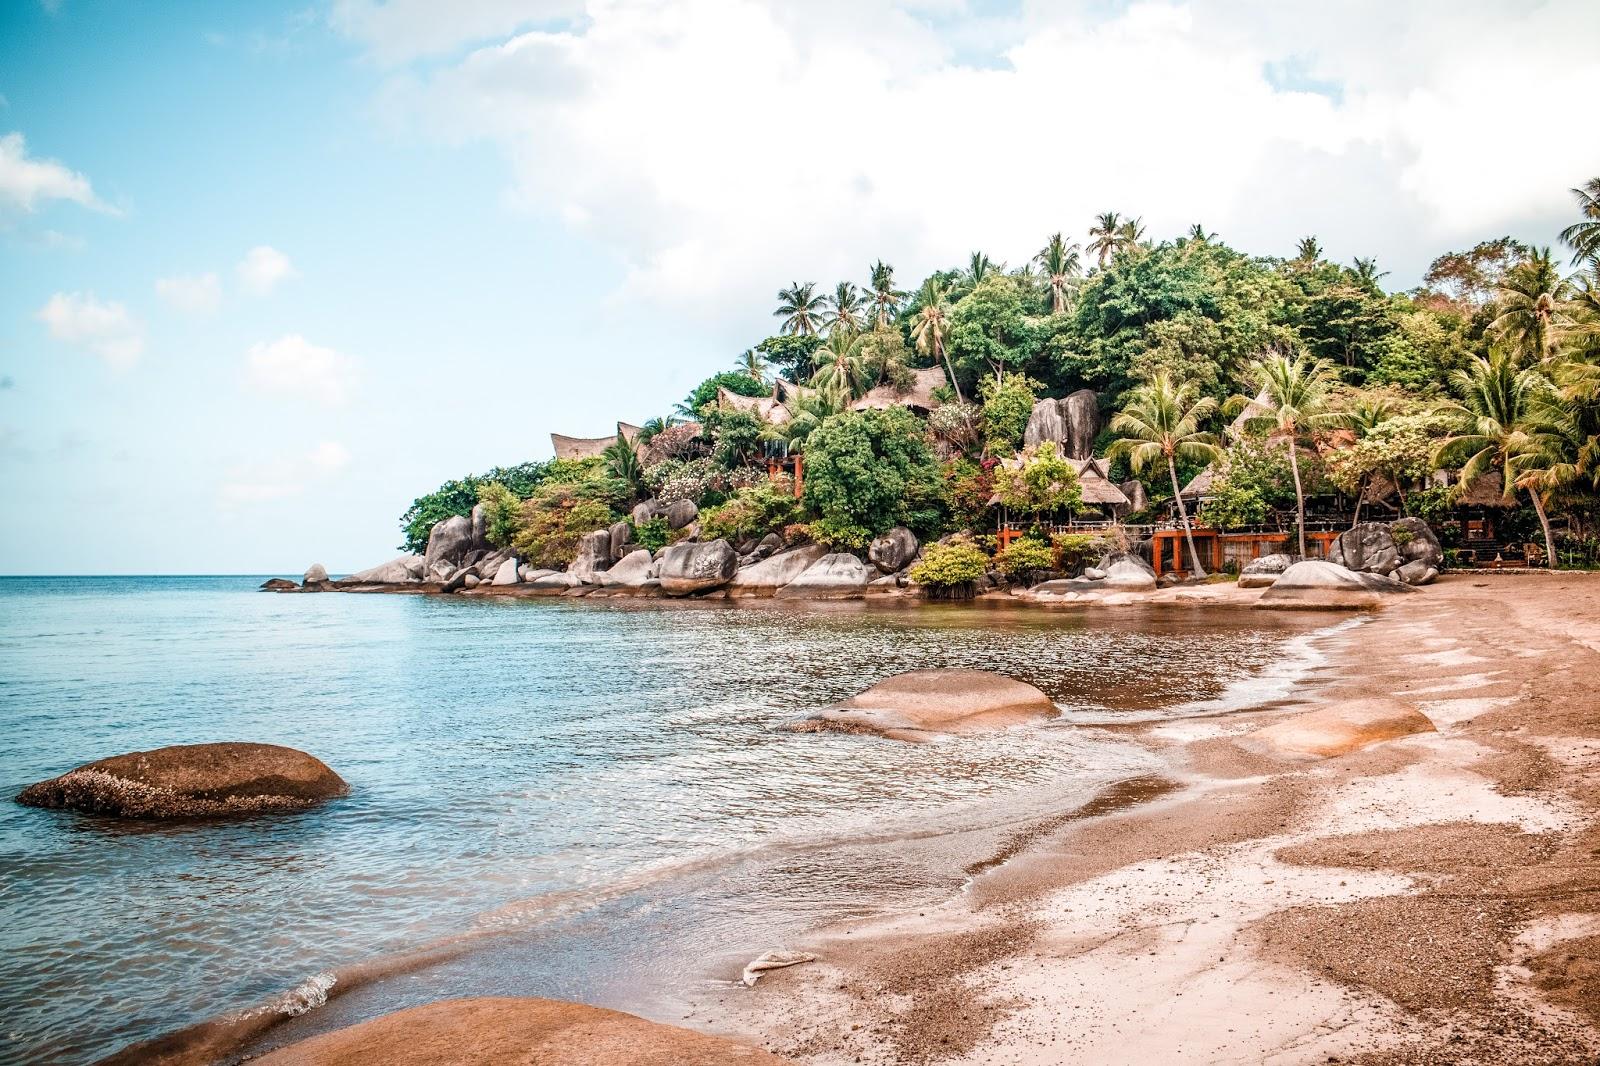 Sairee Beach in Koh Tao